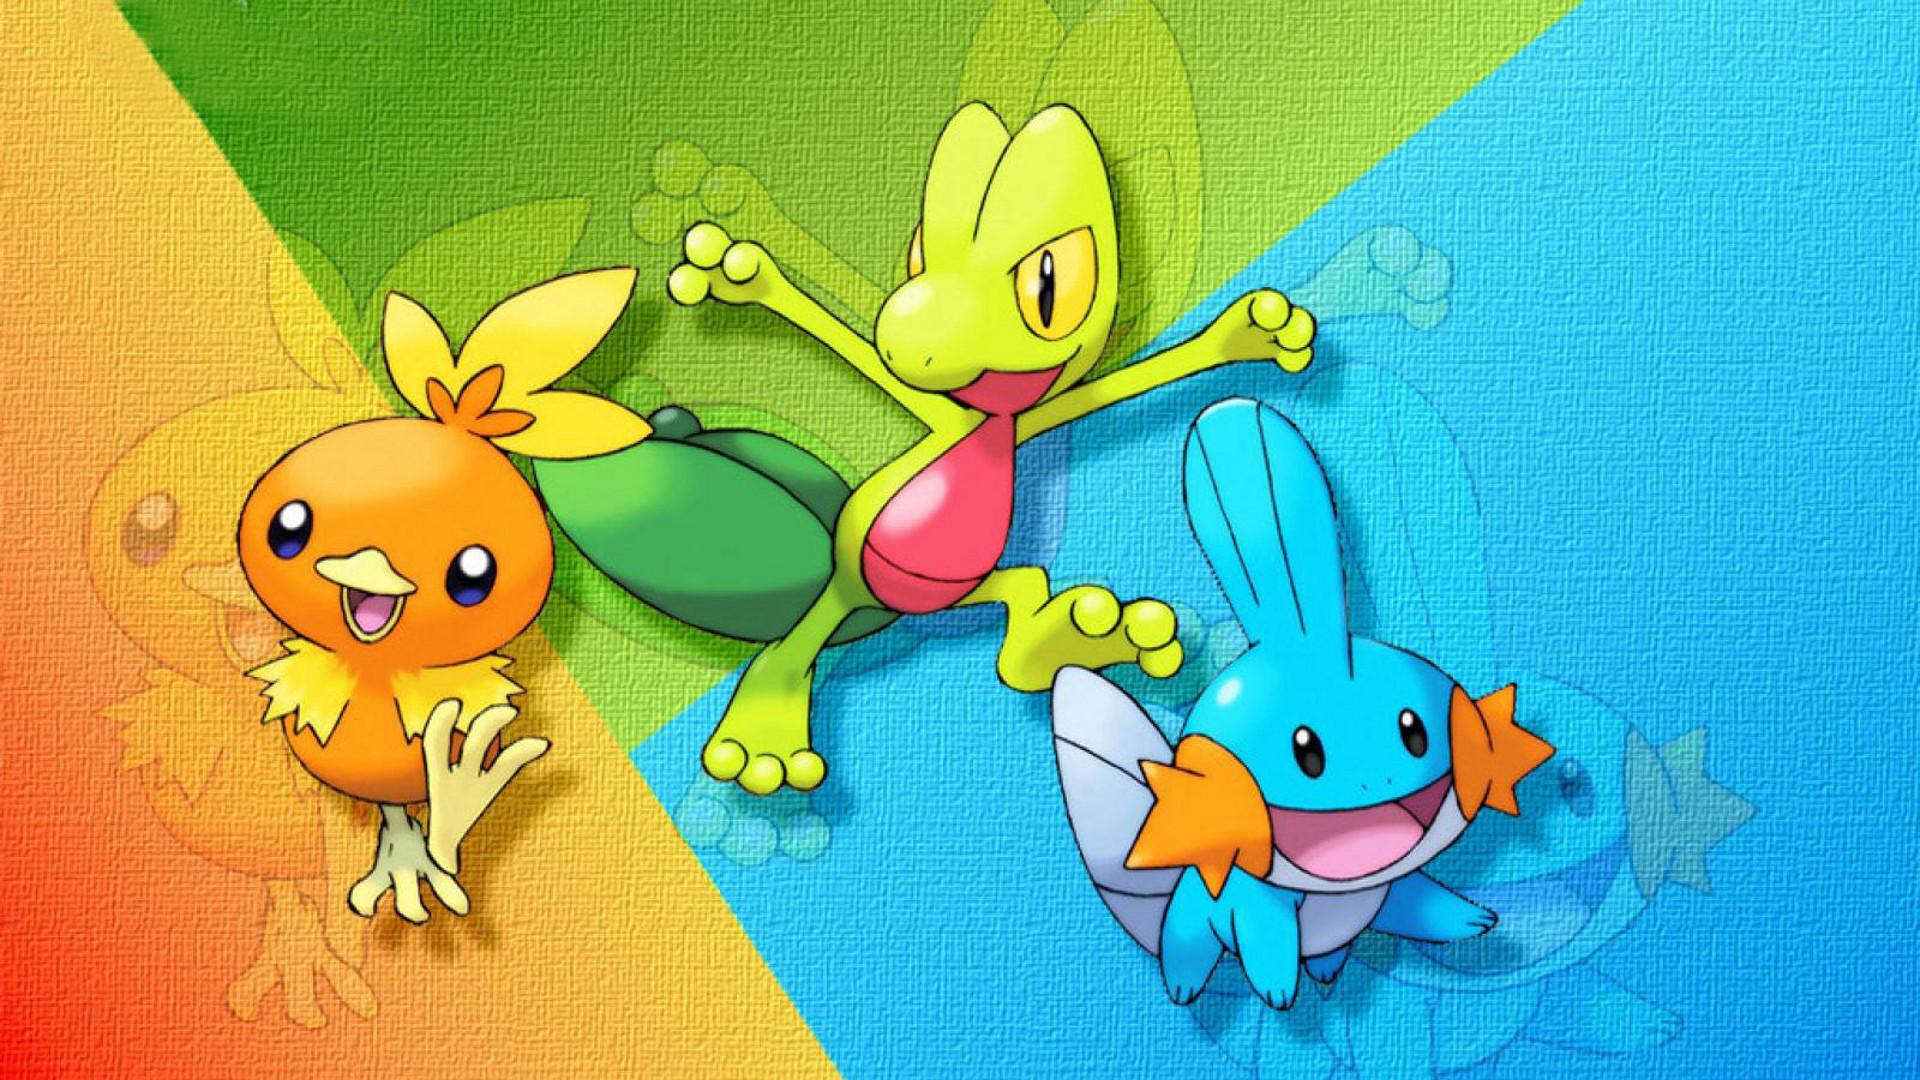 Pokémon Go players form stampede to catch rare Pokémon